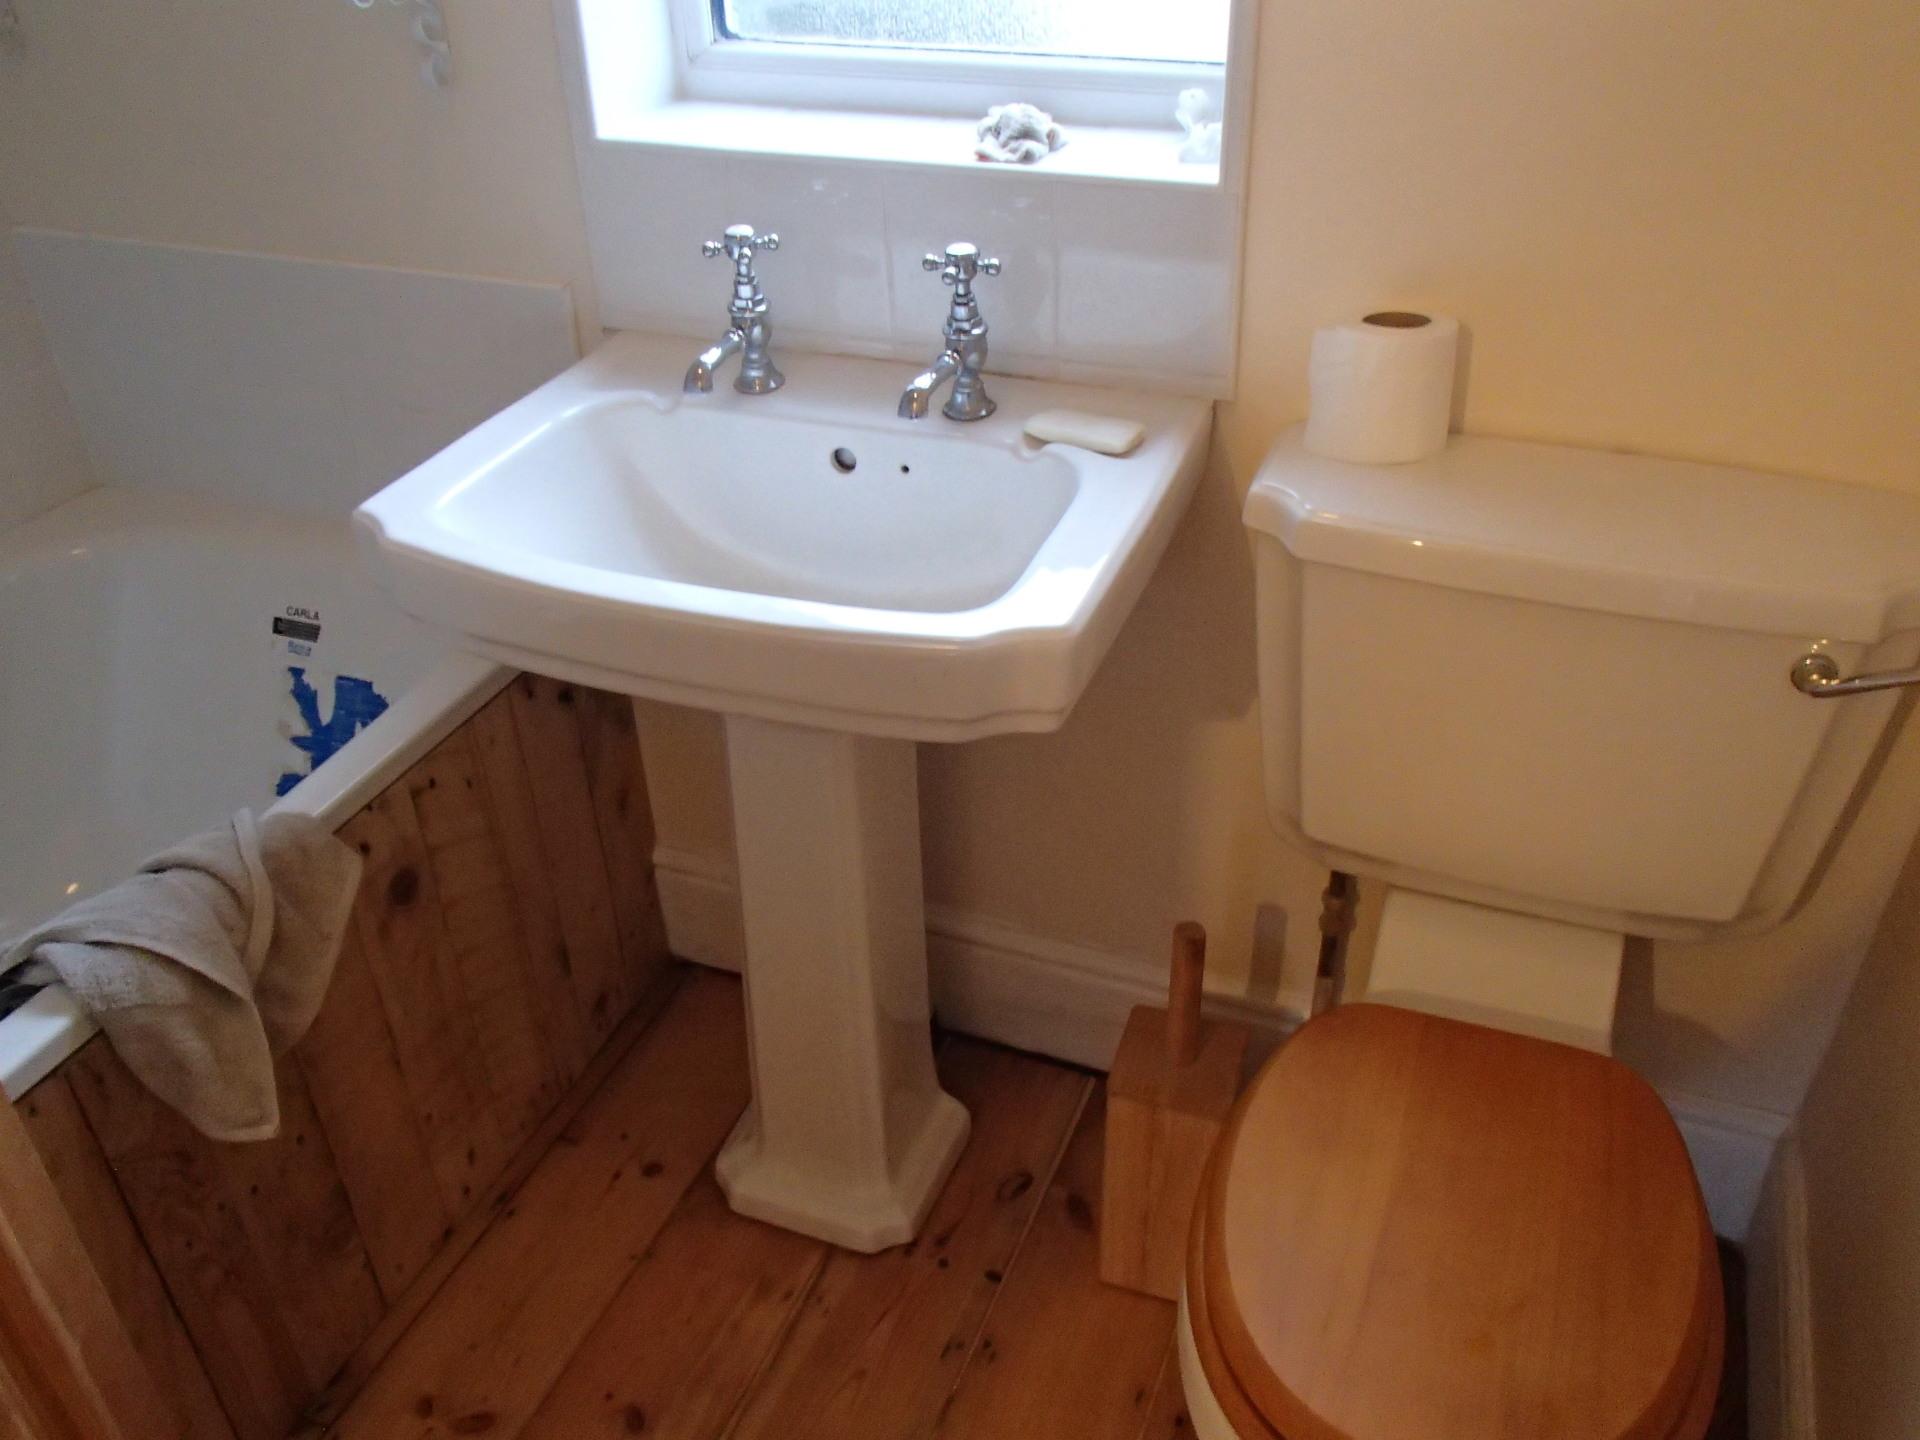 Bathroom, Renovation, Bathroom Fitter, Somerset, Dorset